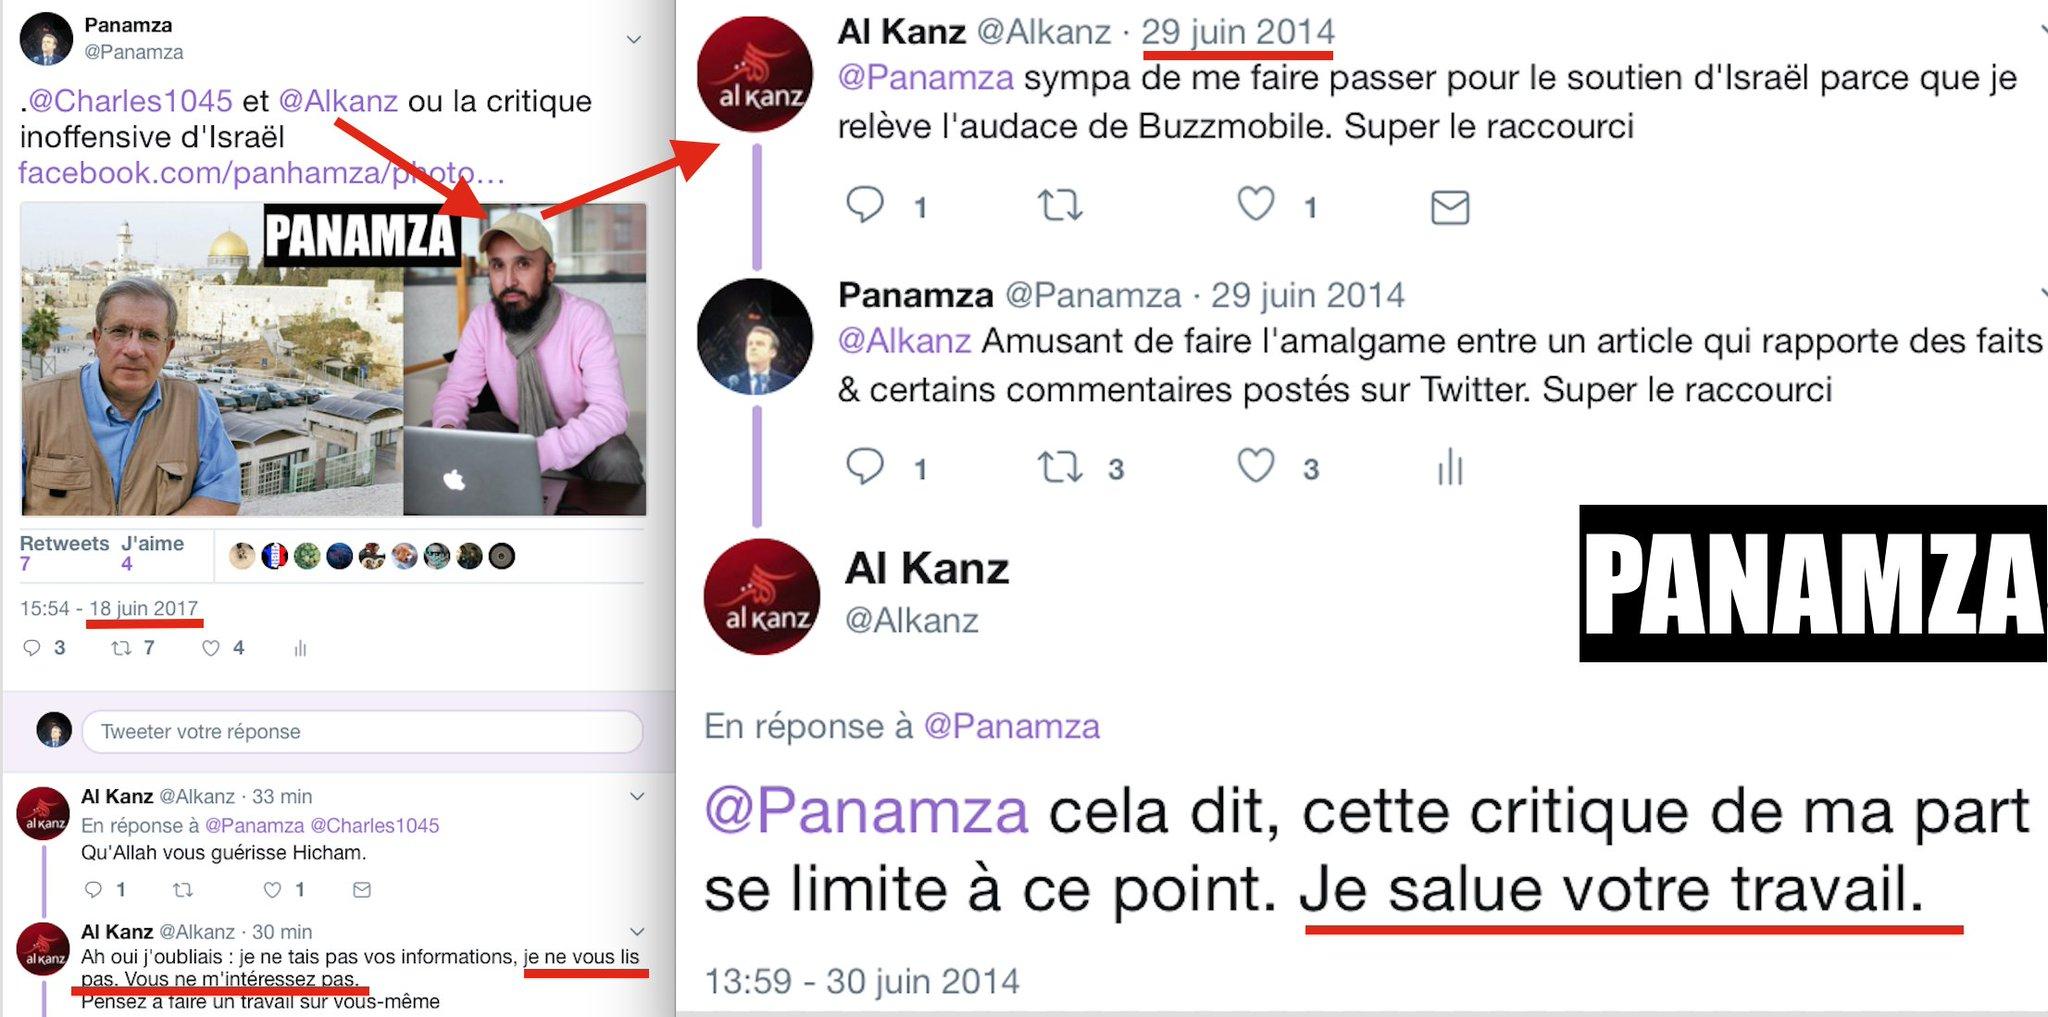 L'hypocrisie d'Al-Kanz en une image